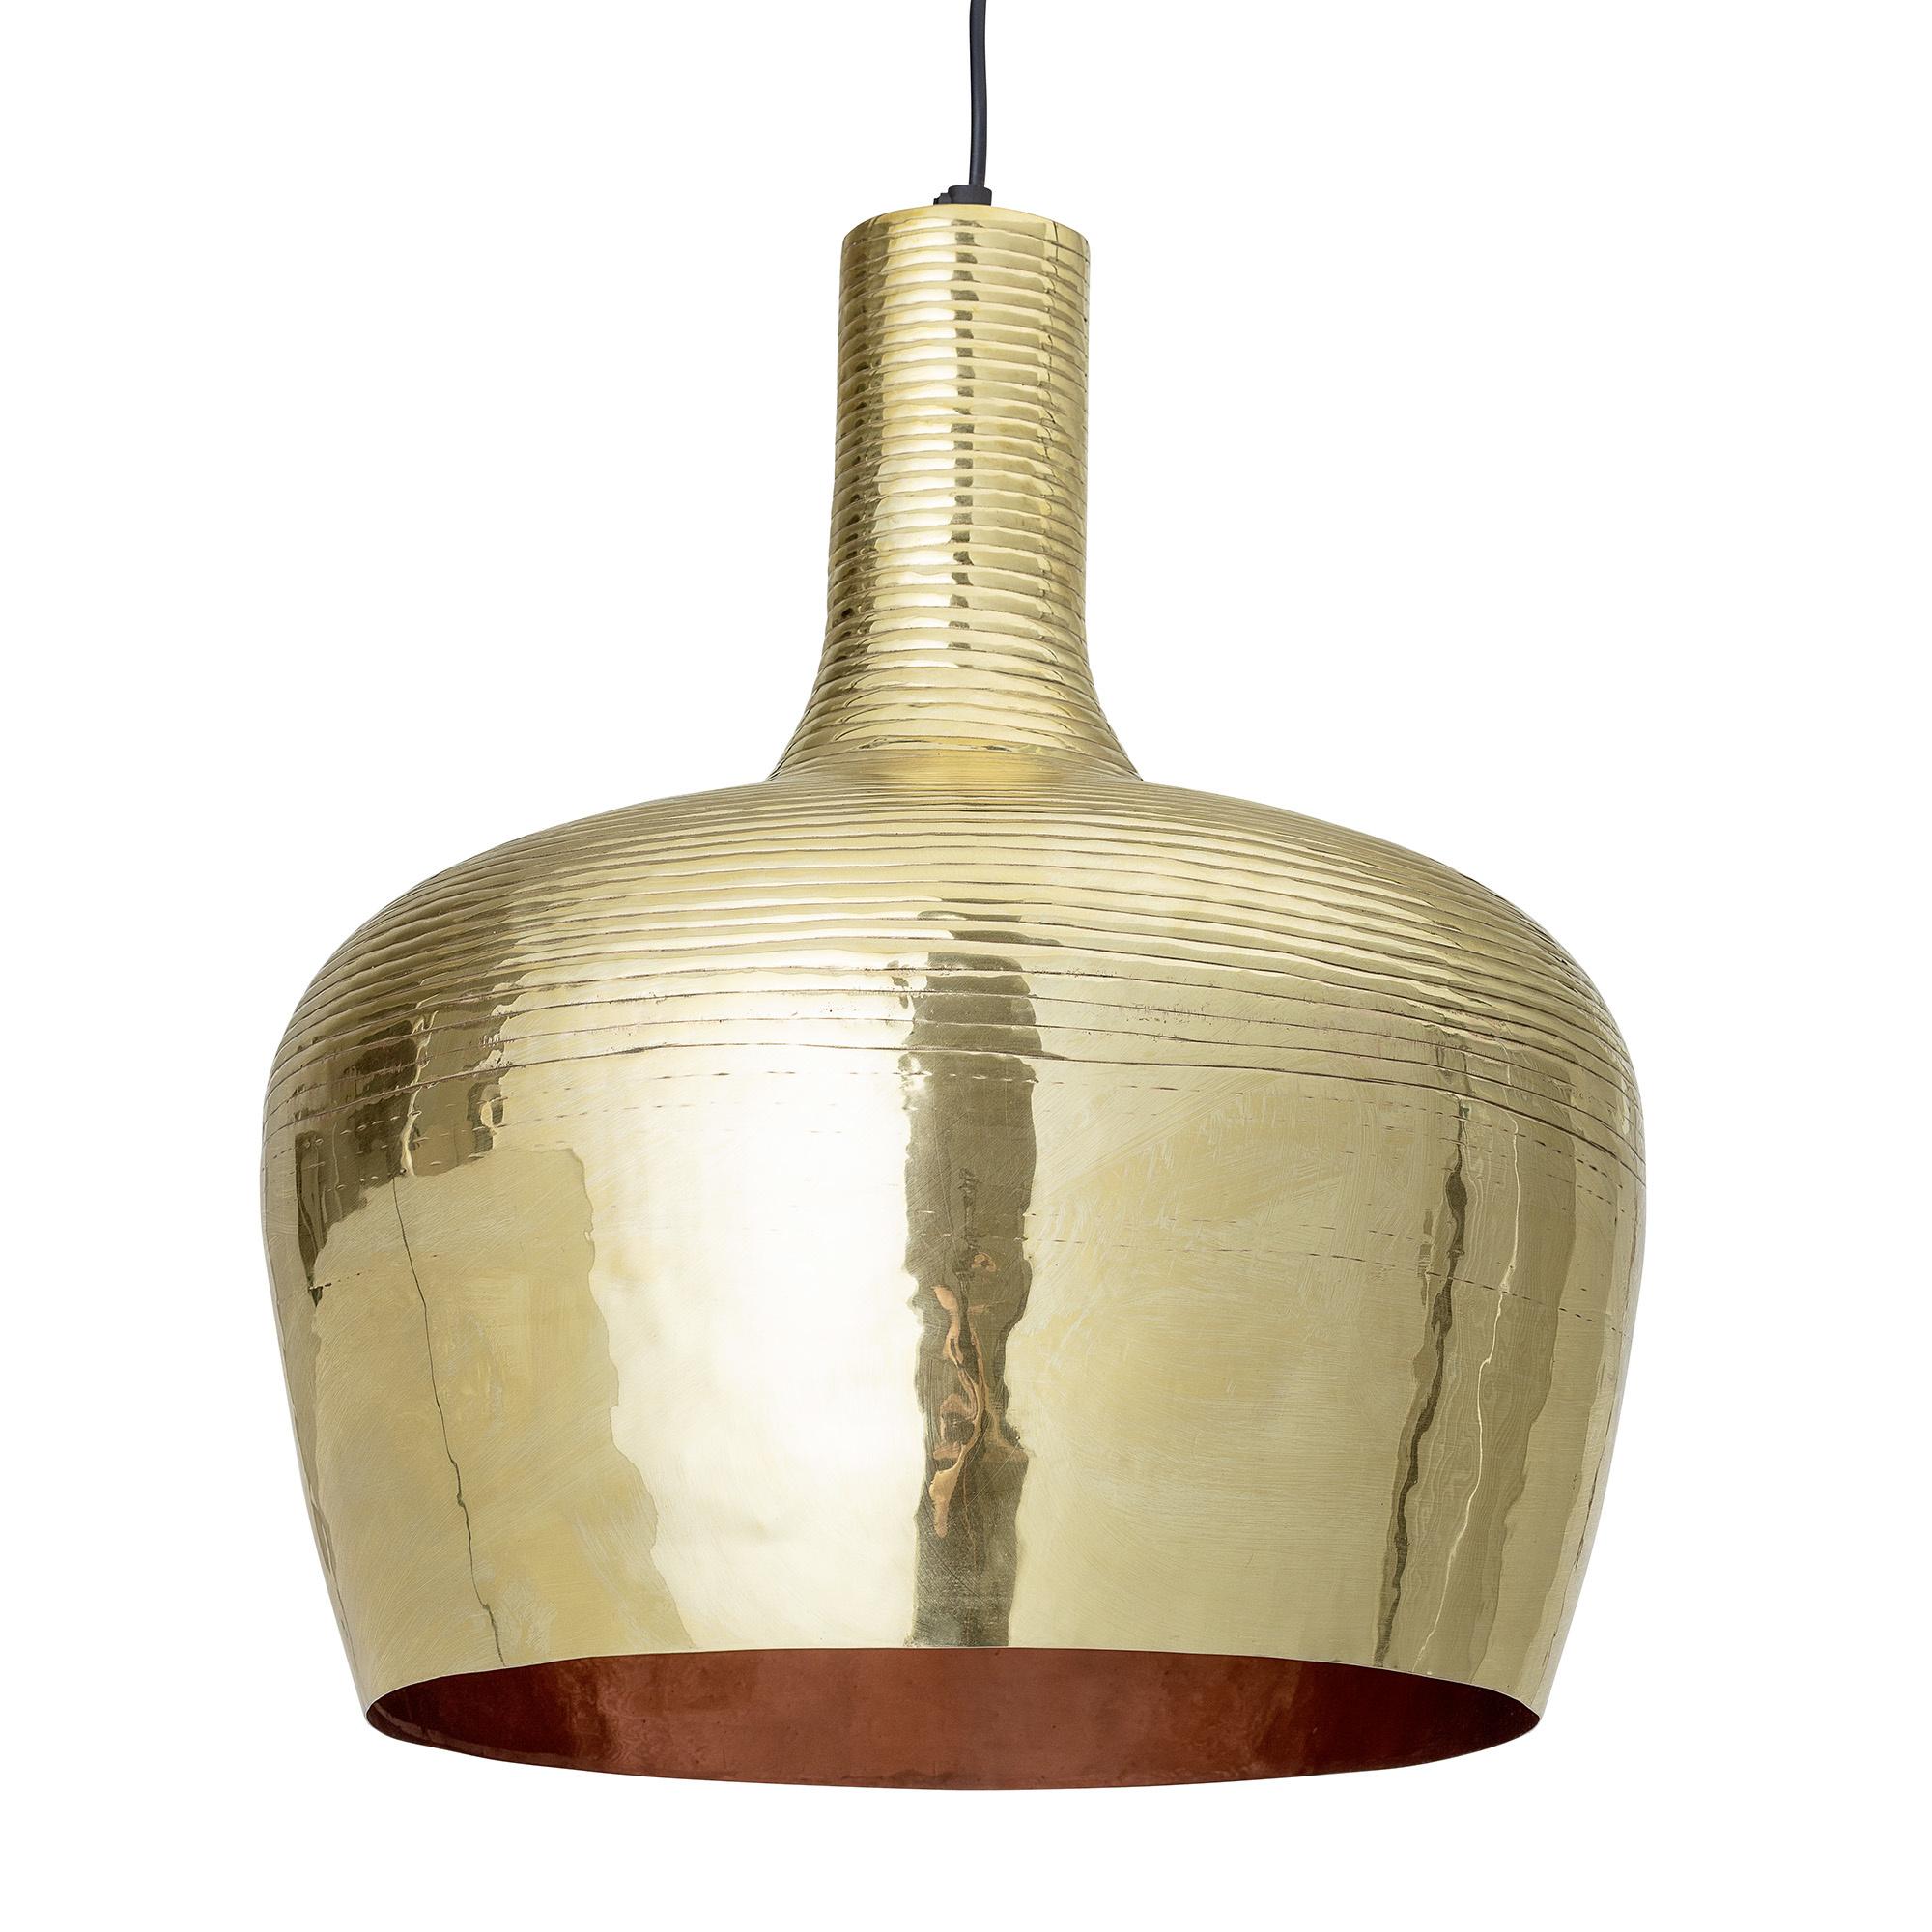 Bloomingville pendant lamp etnic - brass - Ø36xH44cm - Bloomingville